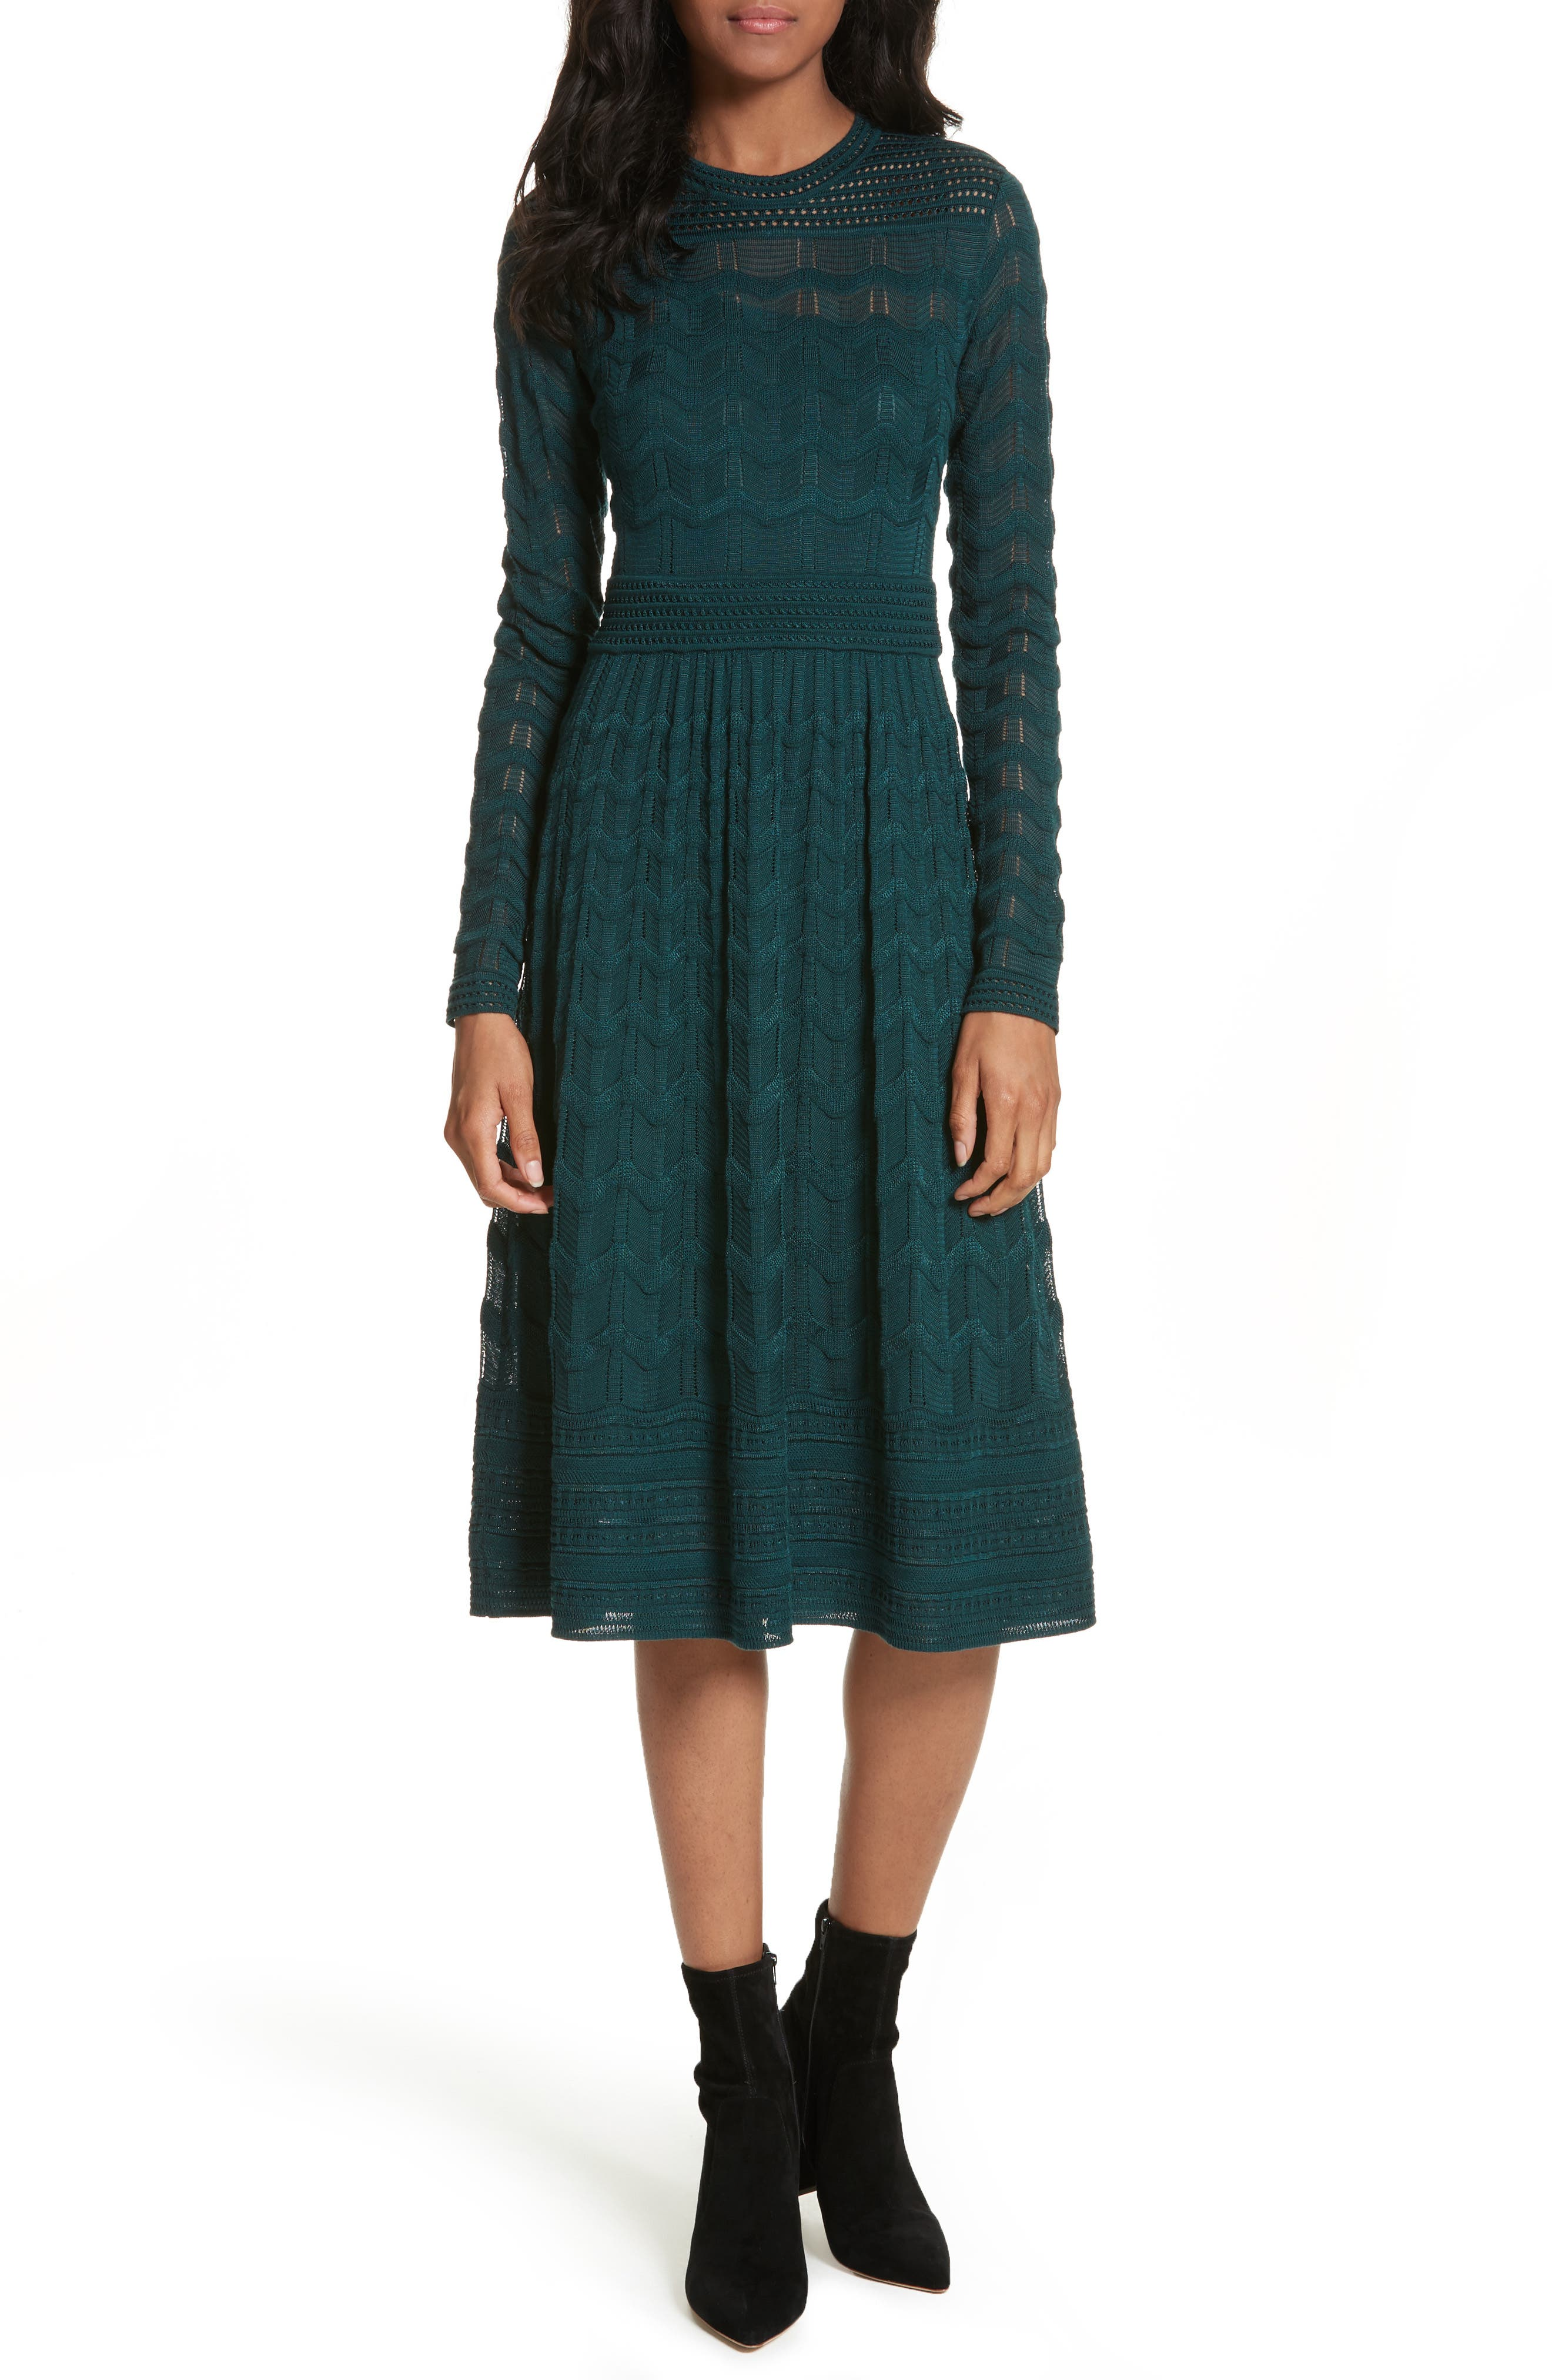 Alternate Image 1 Selected - M Missoni Mesh Detail A-Line Dress